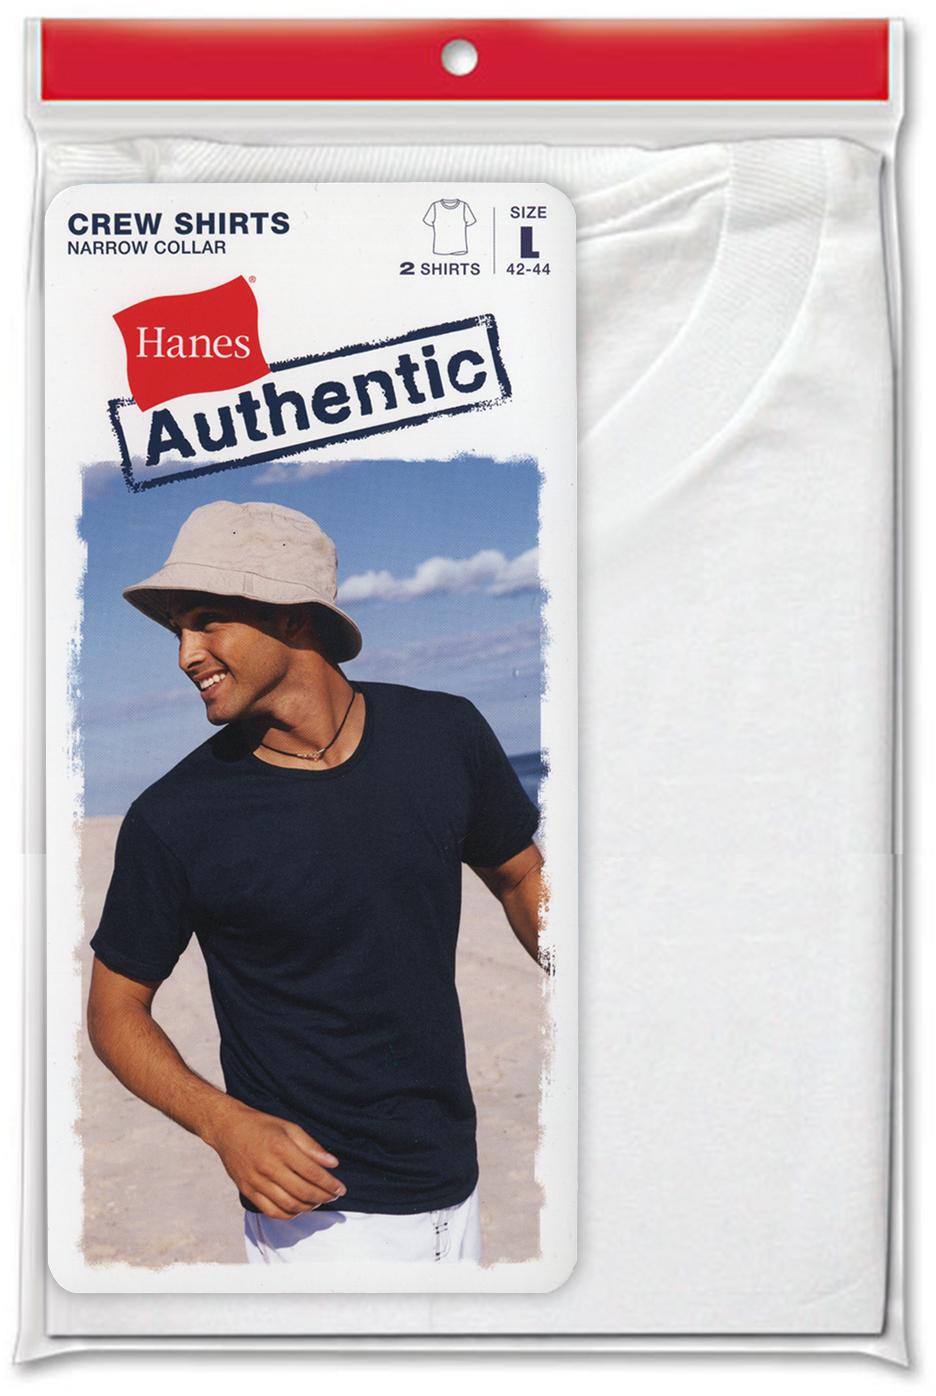 authentic_crew-shirt.jpg